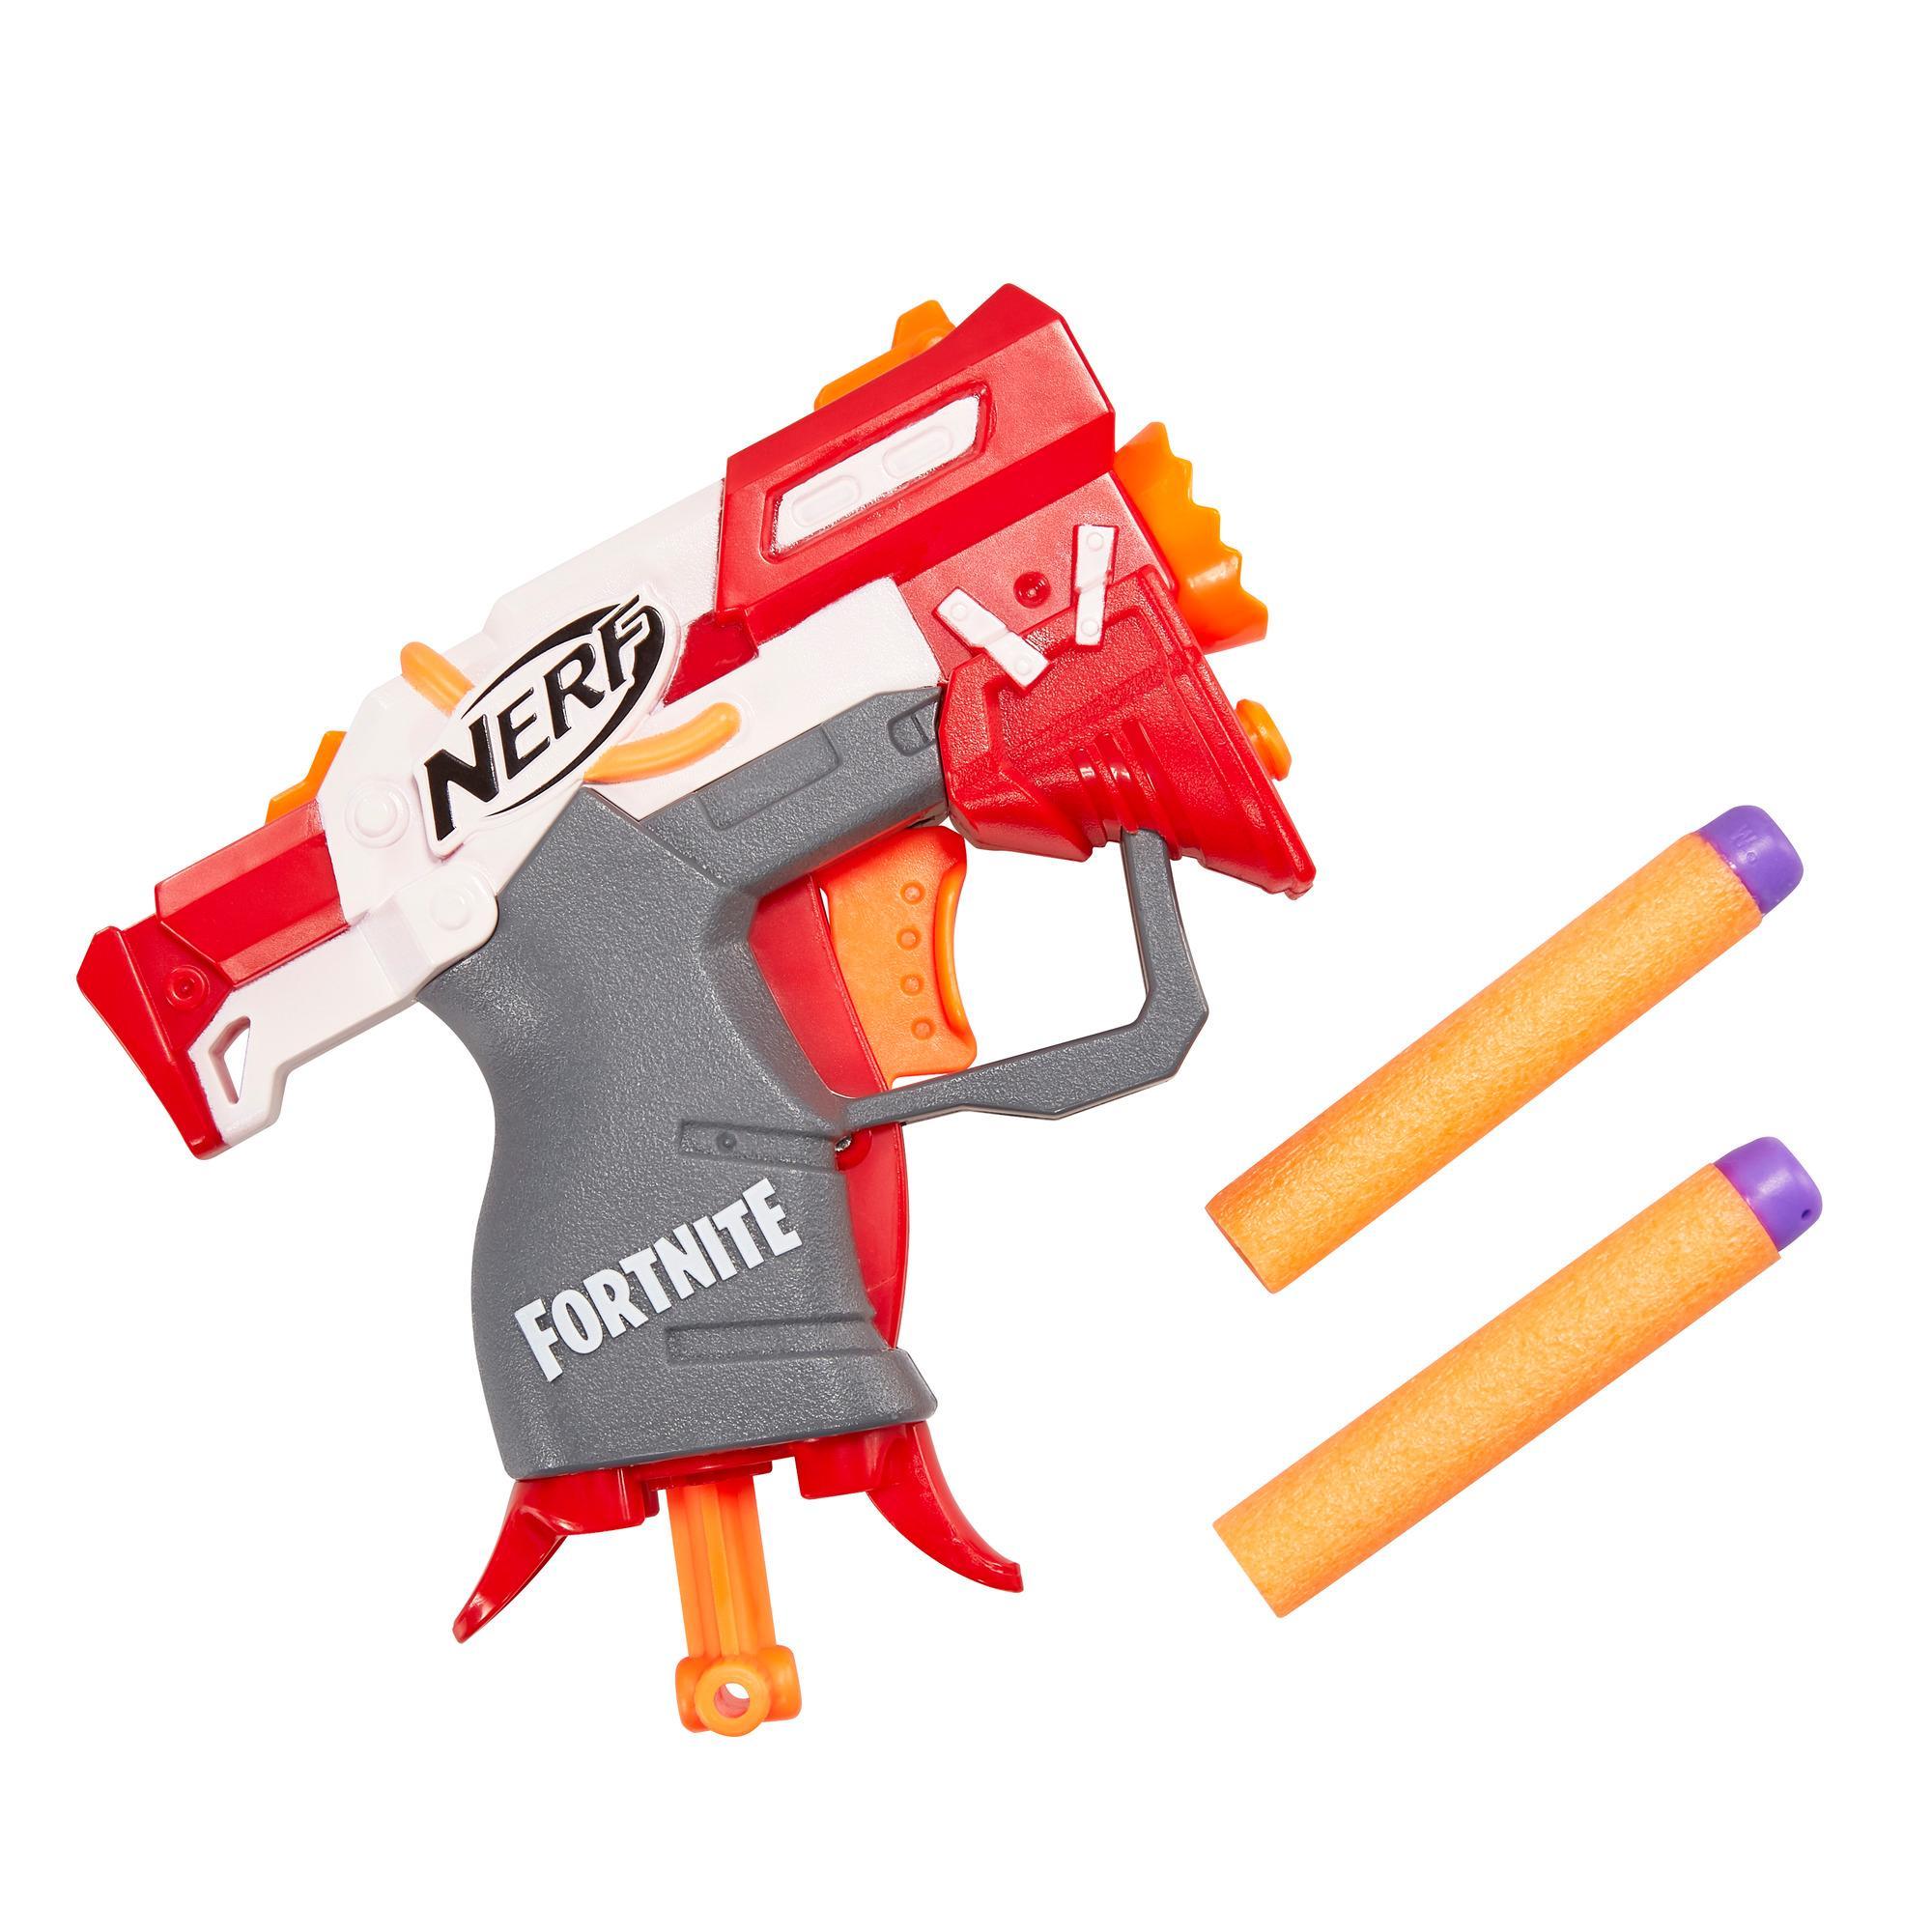 Fortnite TS Nerf MicroShots Dart-Firing Toy Blaster